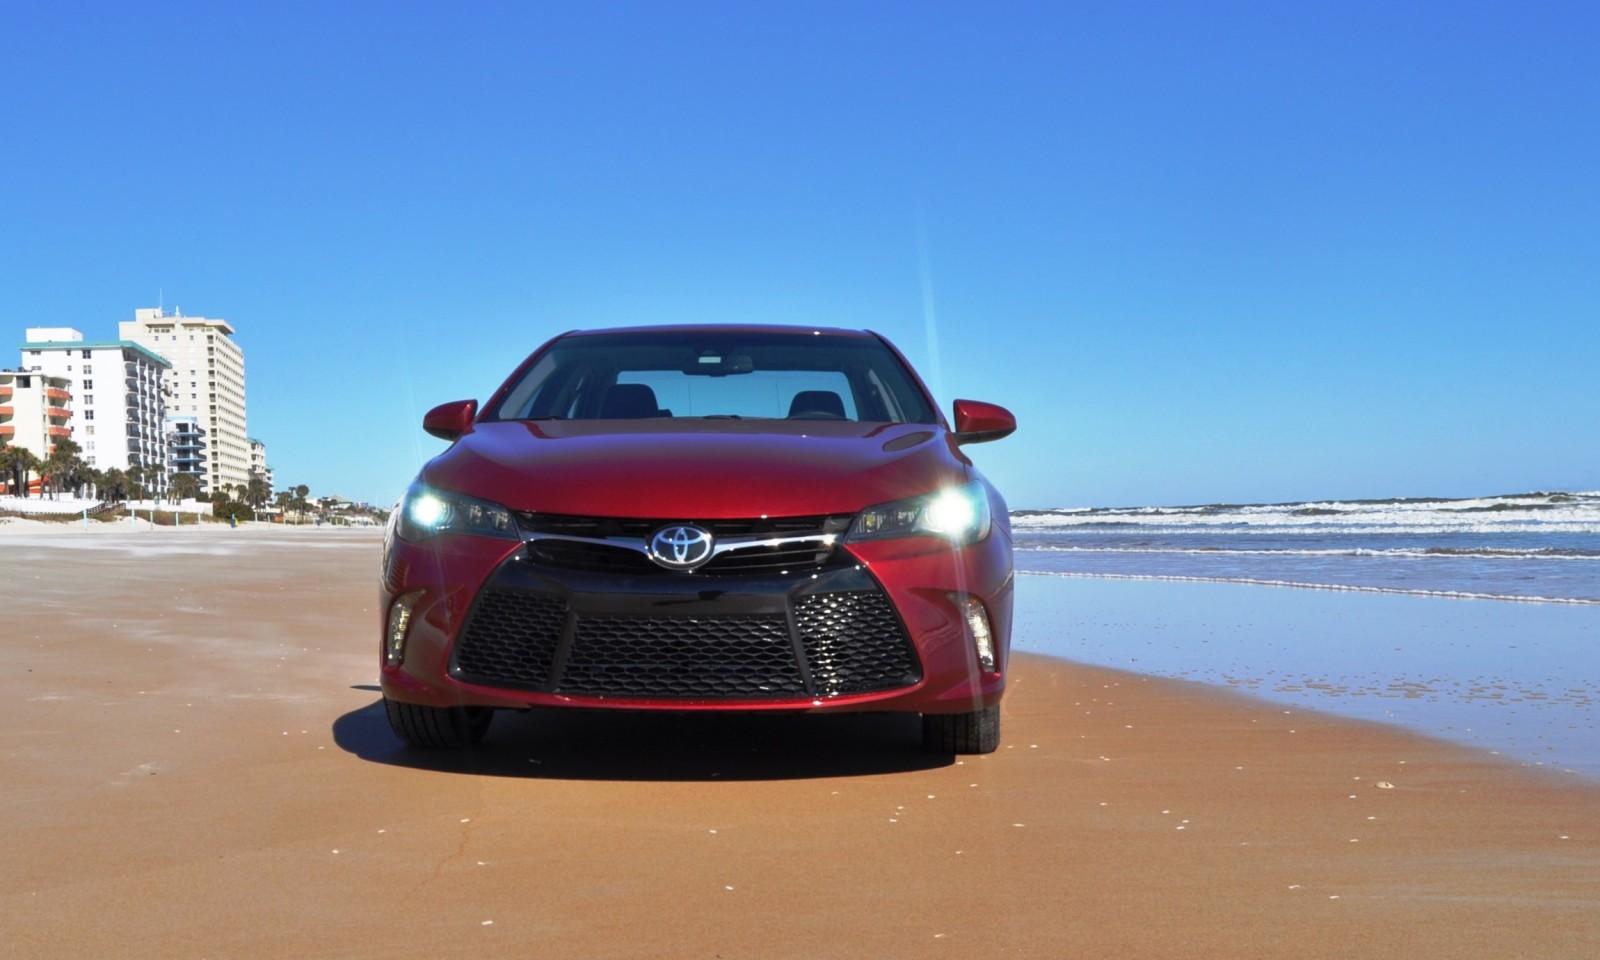 2015 Toyota Camry NASCAR Daytona Beach 47